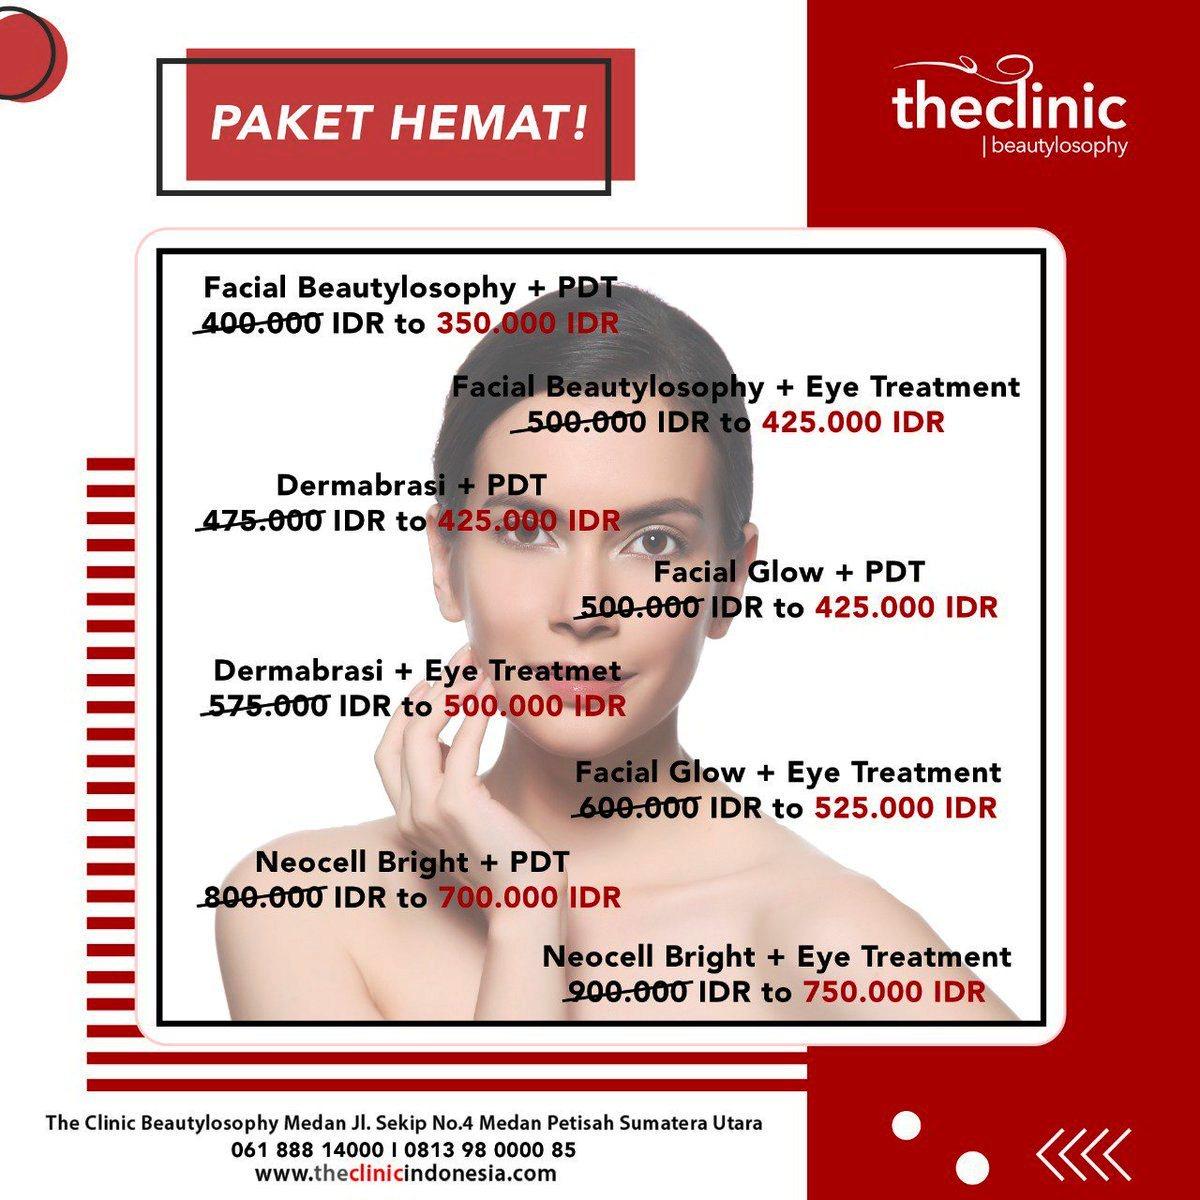 Promo Biaya Perawatan di The Clinic Beautylosophy